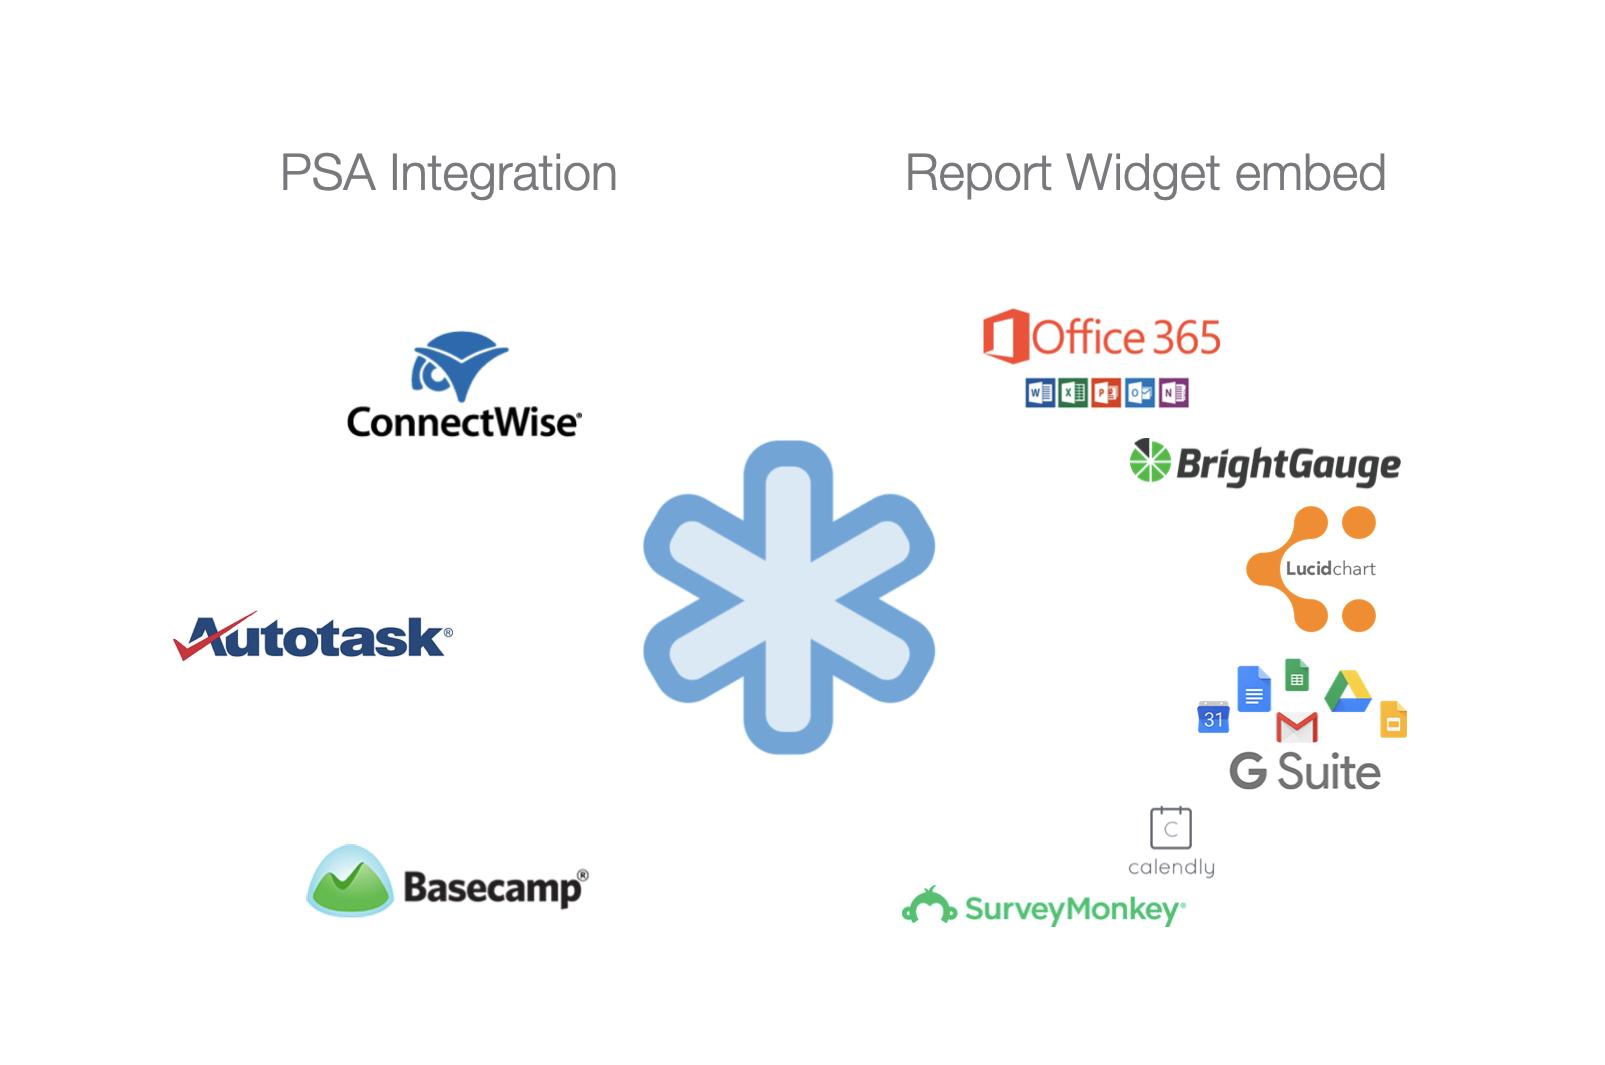 Integrations of the Managed Services Platform